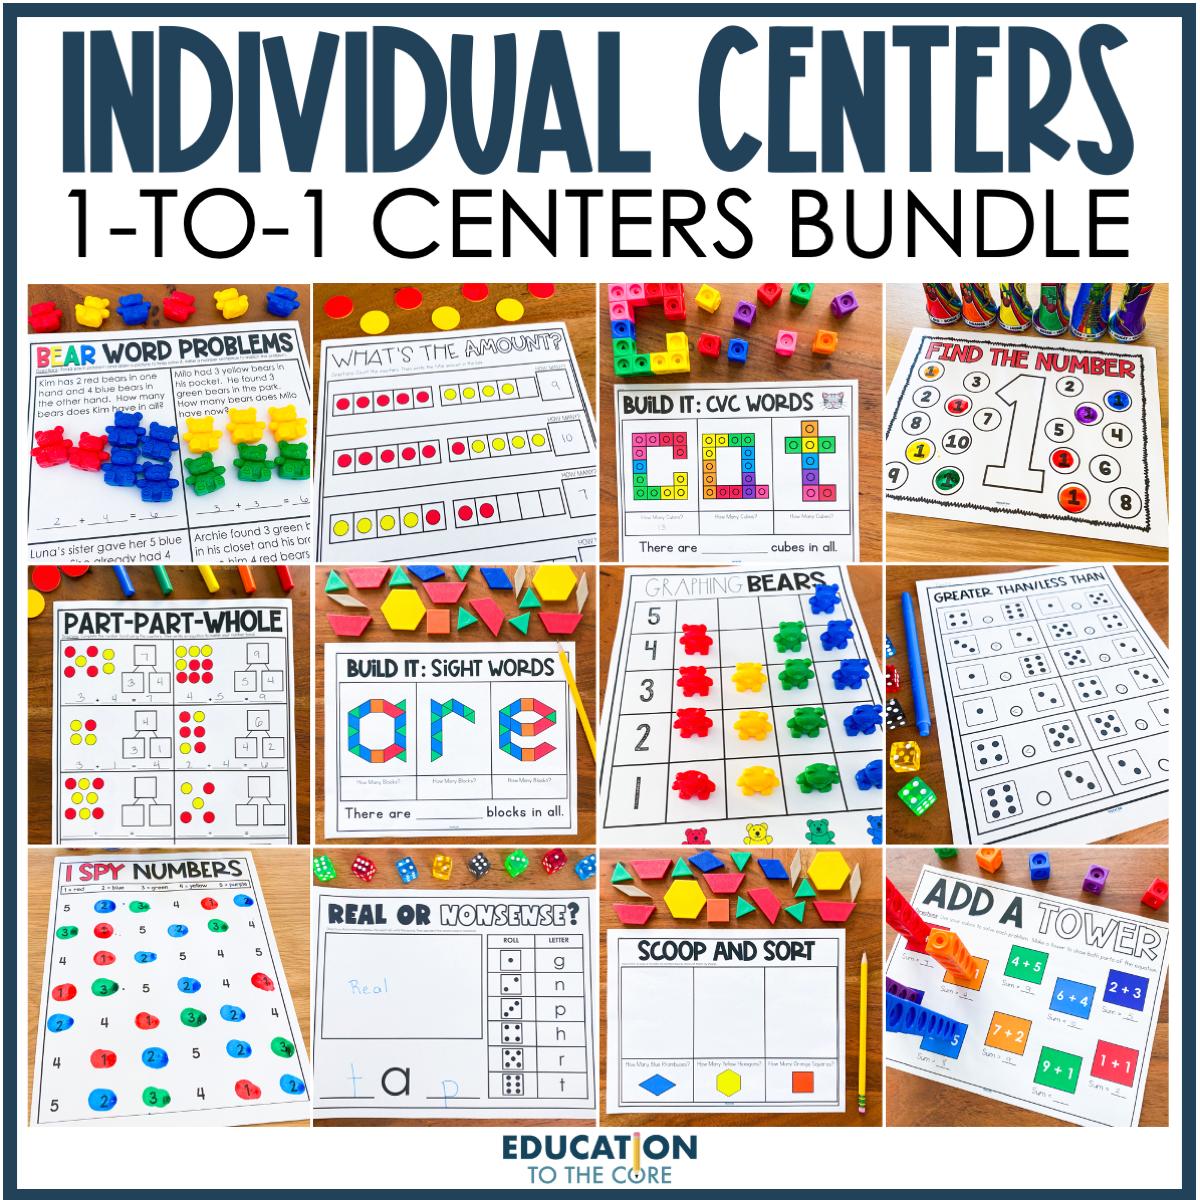 Individual Centers Bundle